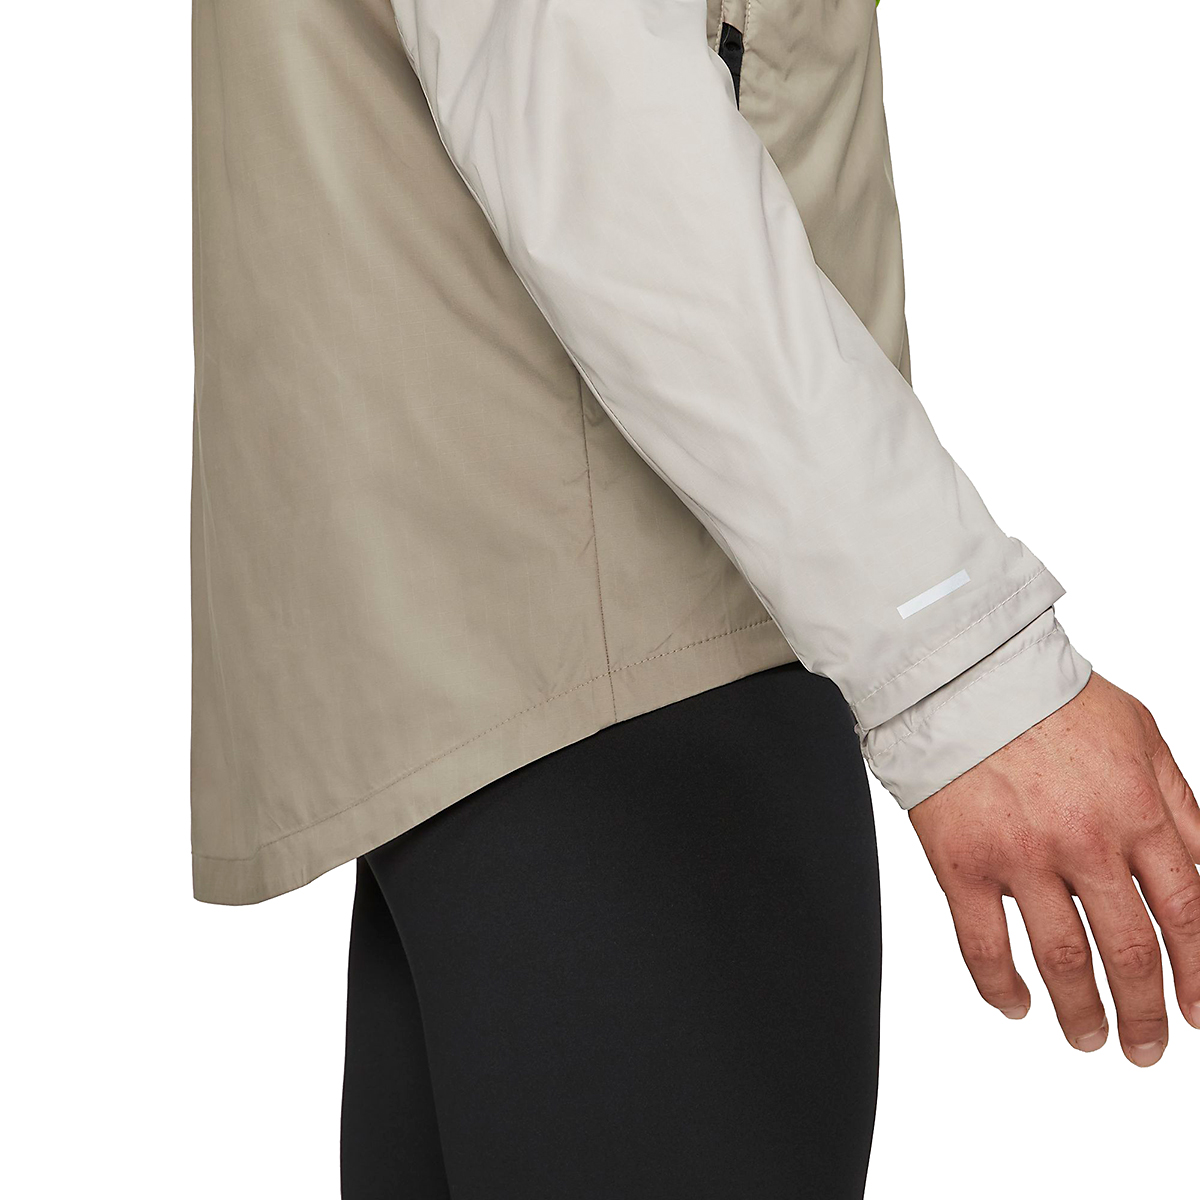 Men's Nike Windrunner Trail Running Jacket - Color: Light Lemon Twist/Moon Fossil/Bright Spruce - Size: S, Light Lemon Twist/Moon Fossil/Bright Spruce, large, image 6